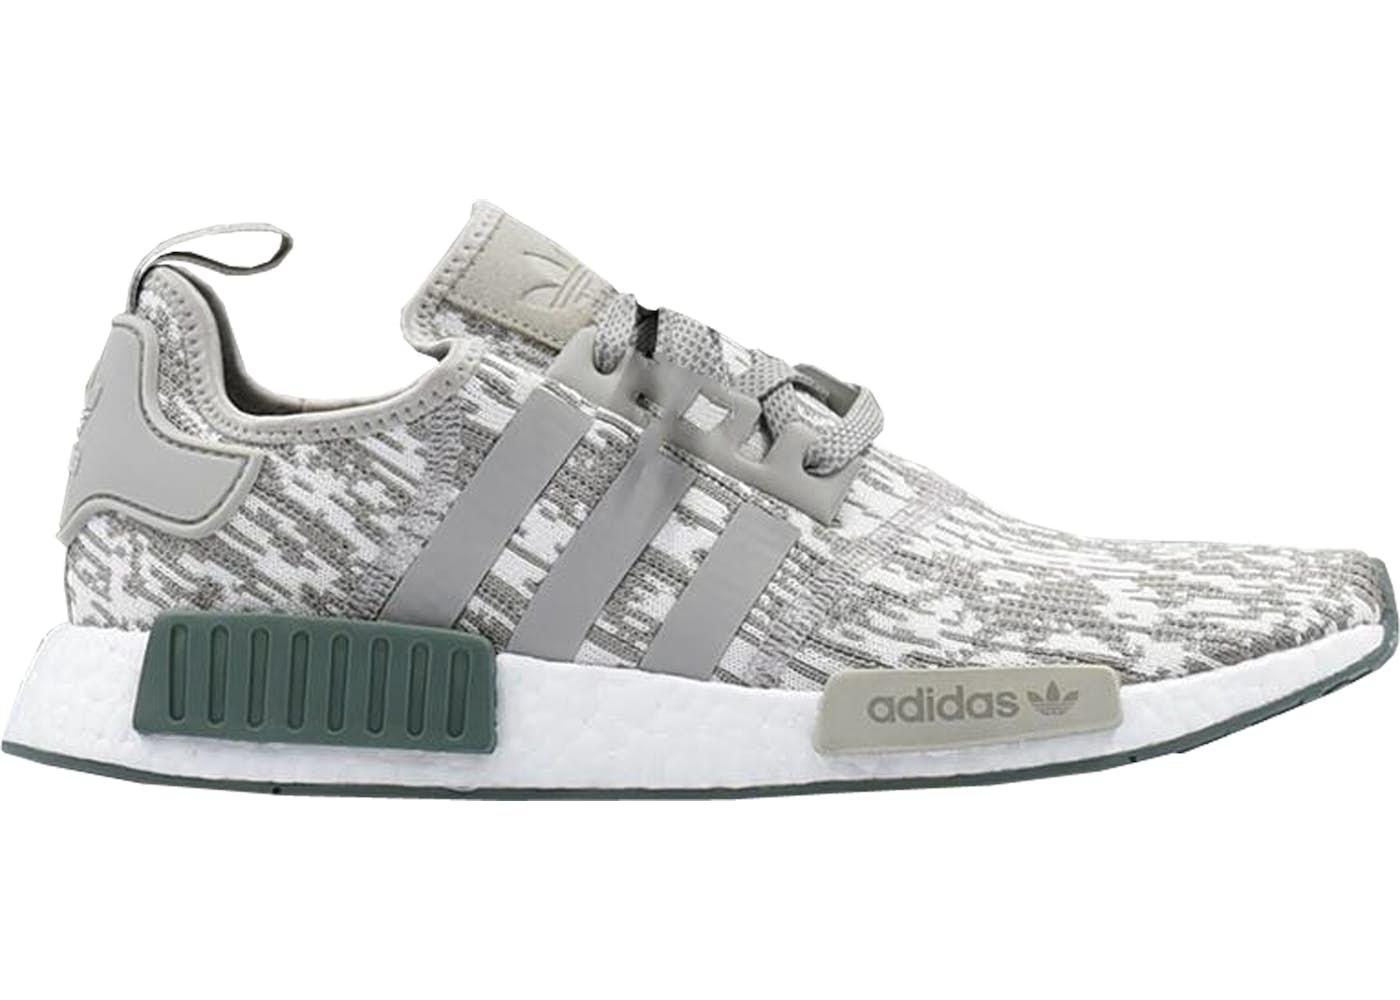 50% korting Adidas Yeezy Boost 350 V2